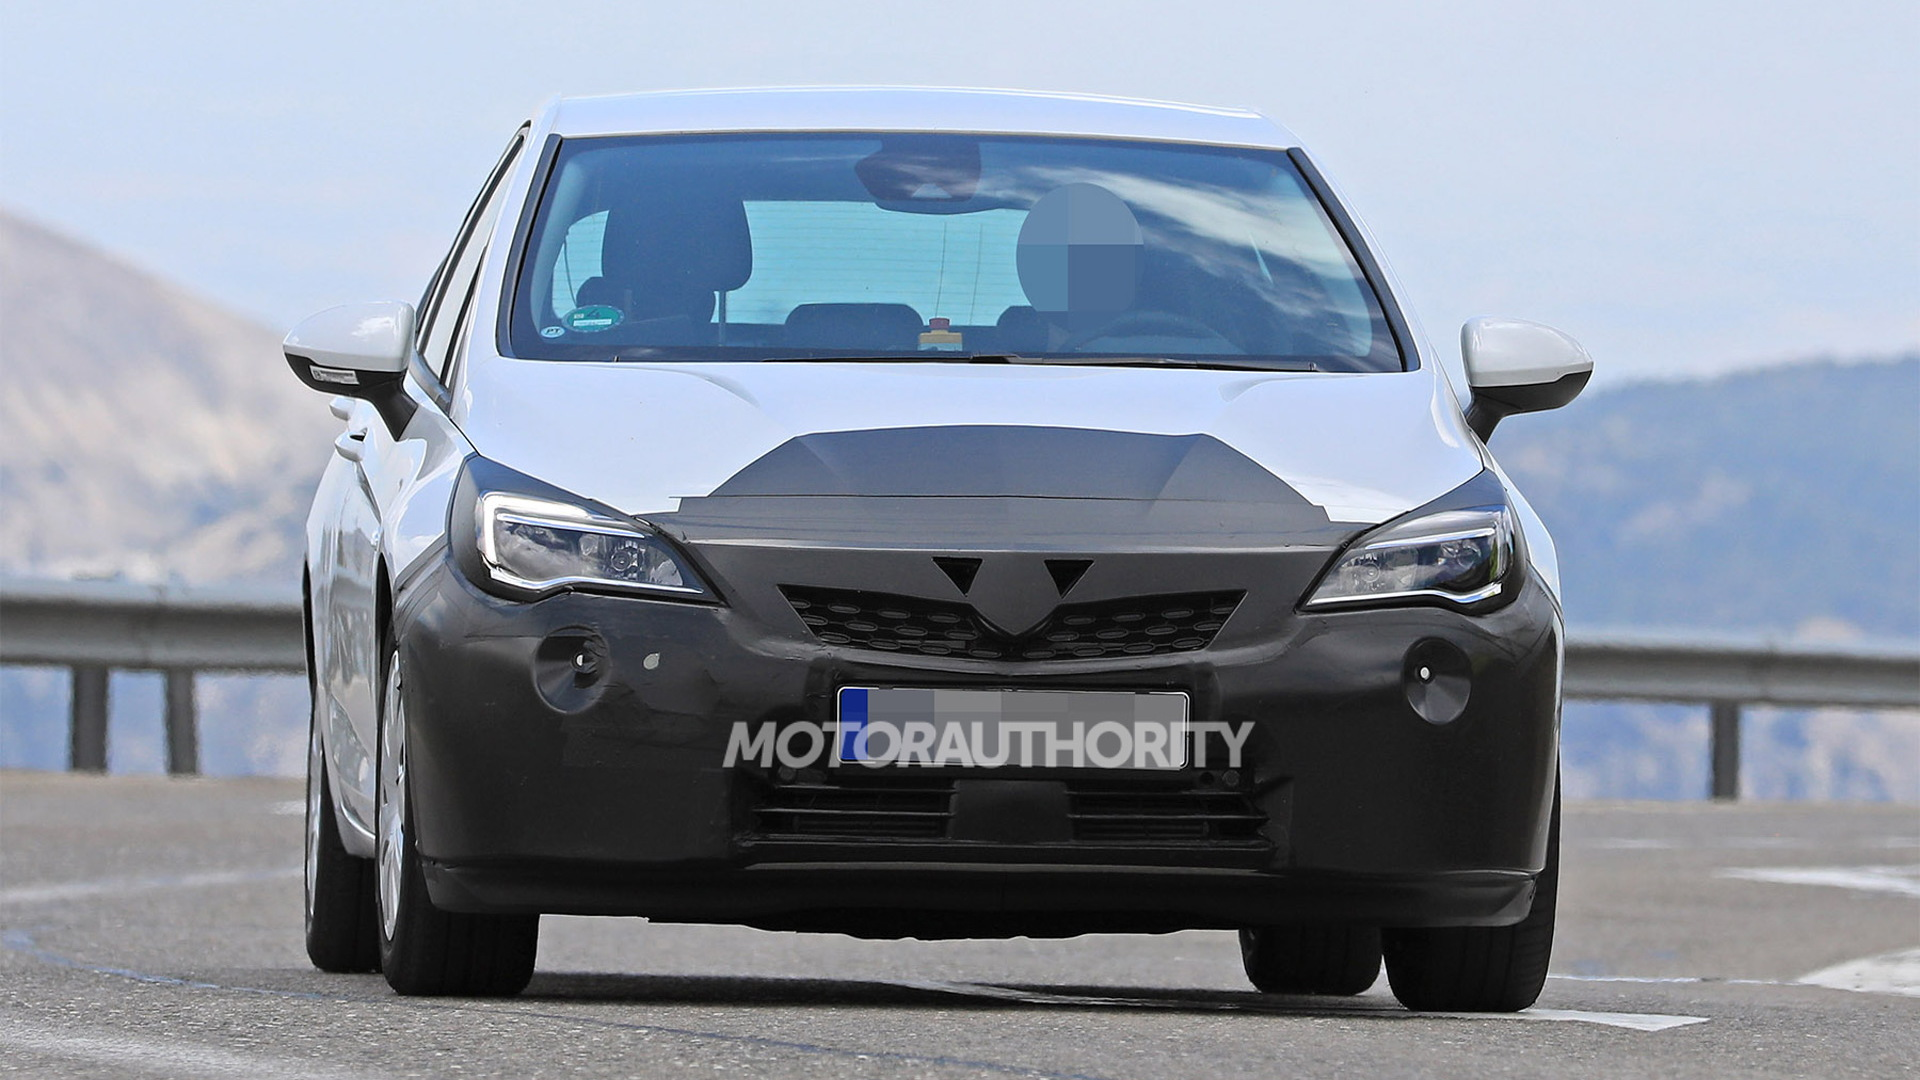 2019 Opel Astra facelift spy shots - Image via S. Baldauf/SB-Medien